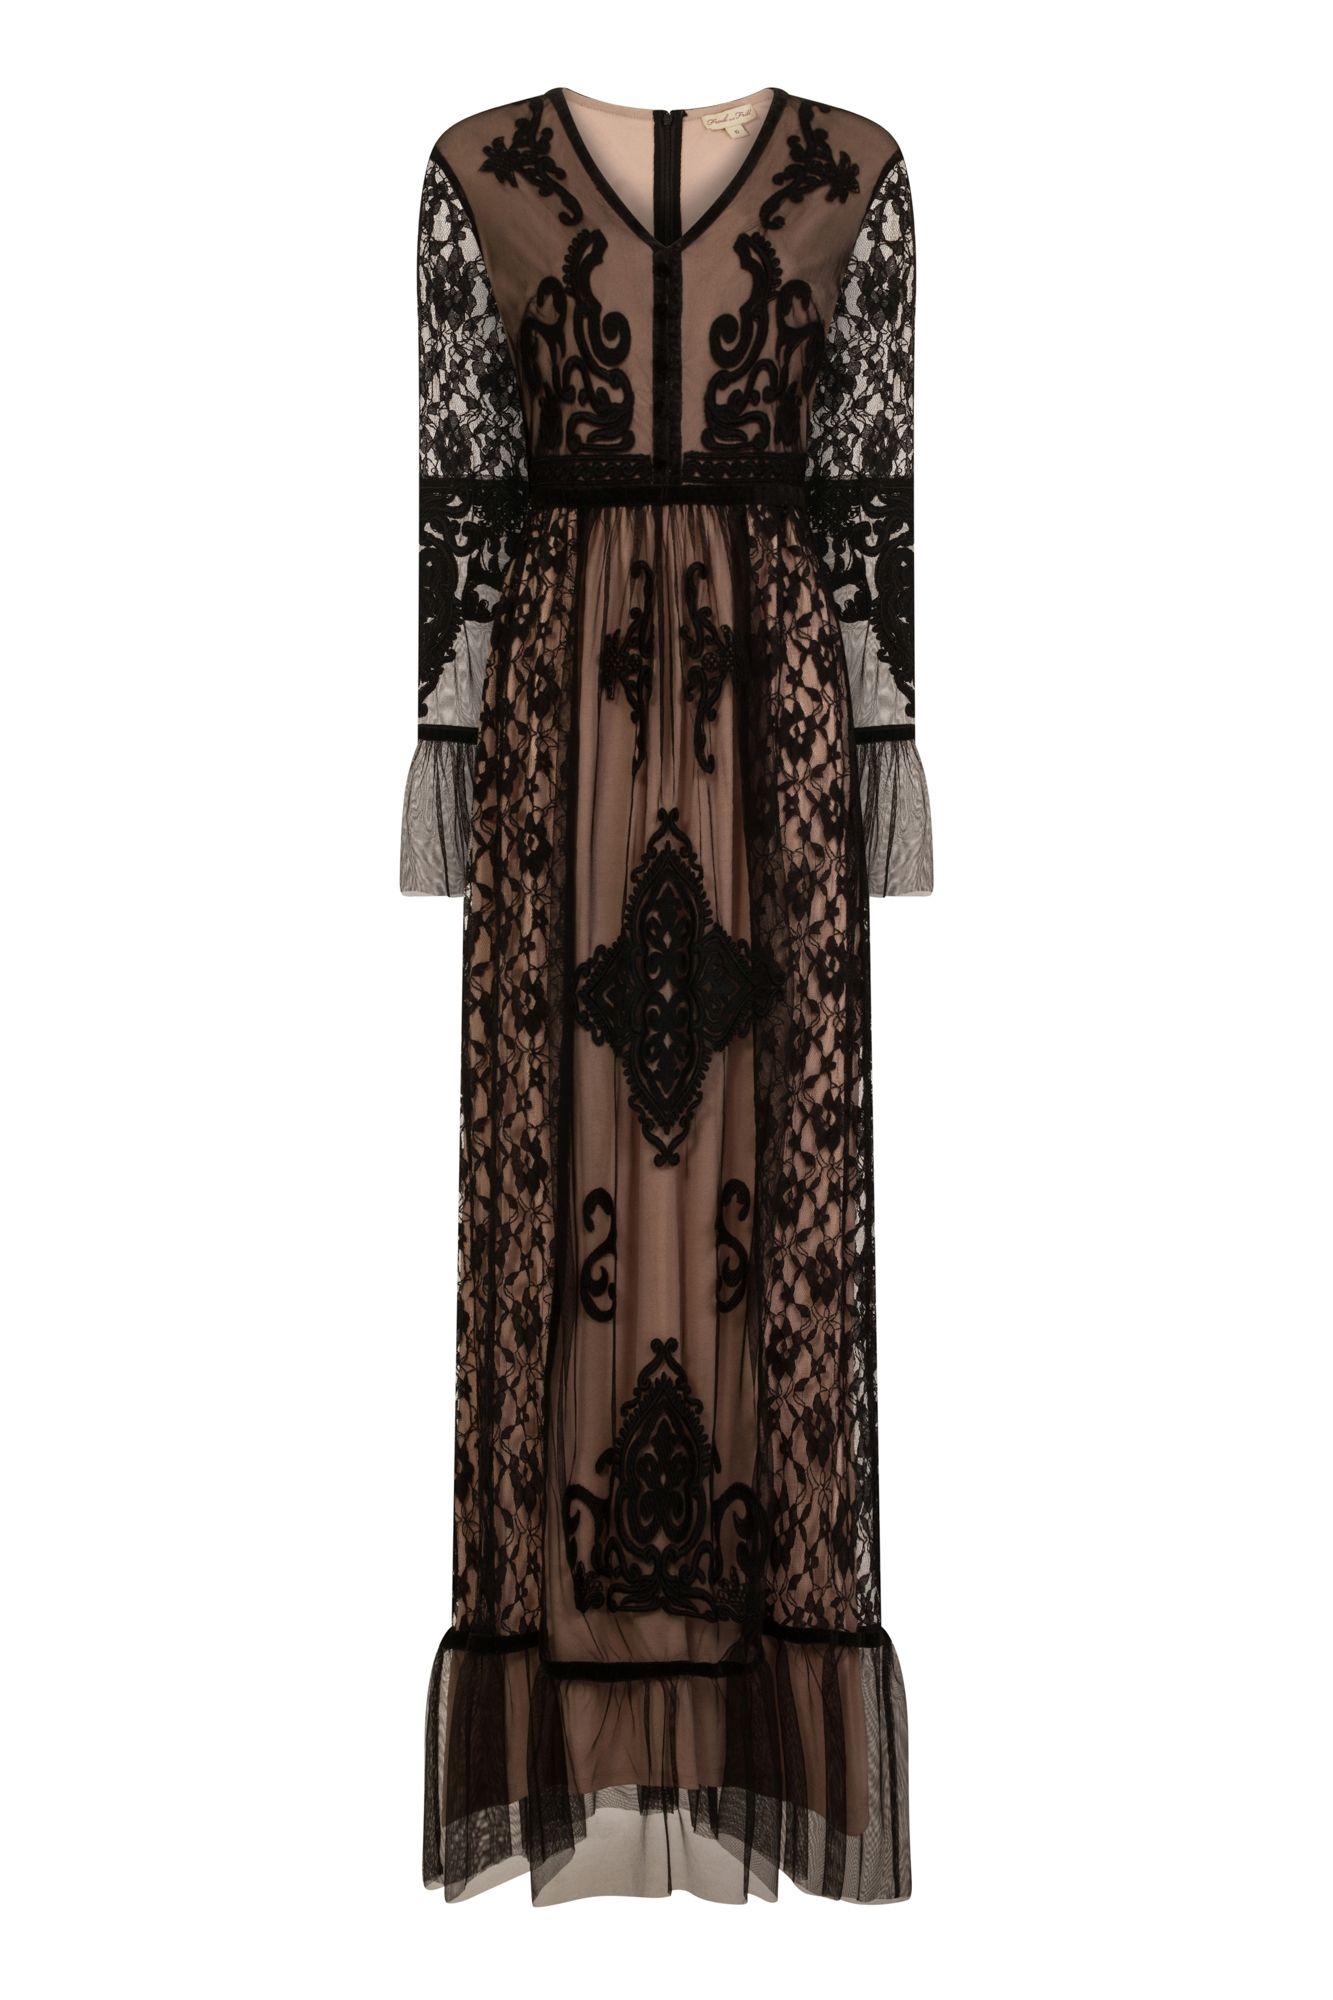 b4551c00ba Frock and Frill Fosetta Black Mesh And Lace Maxi Dress